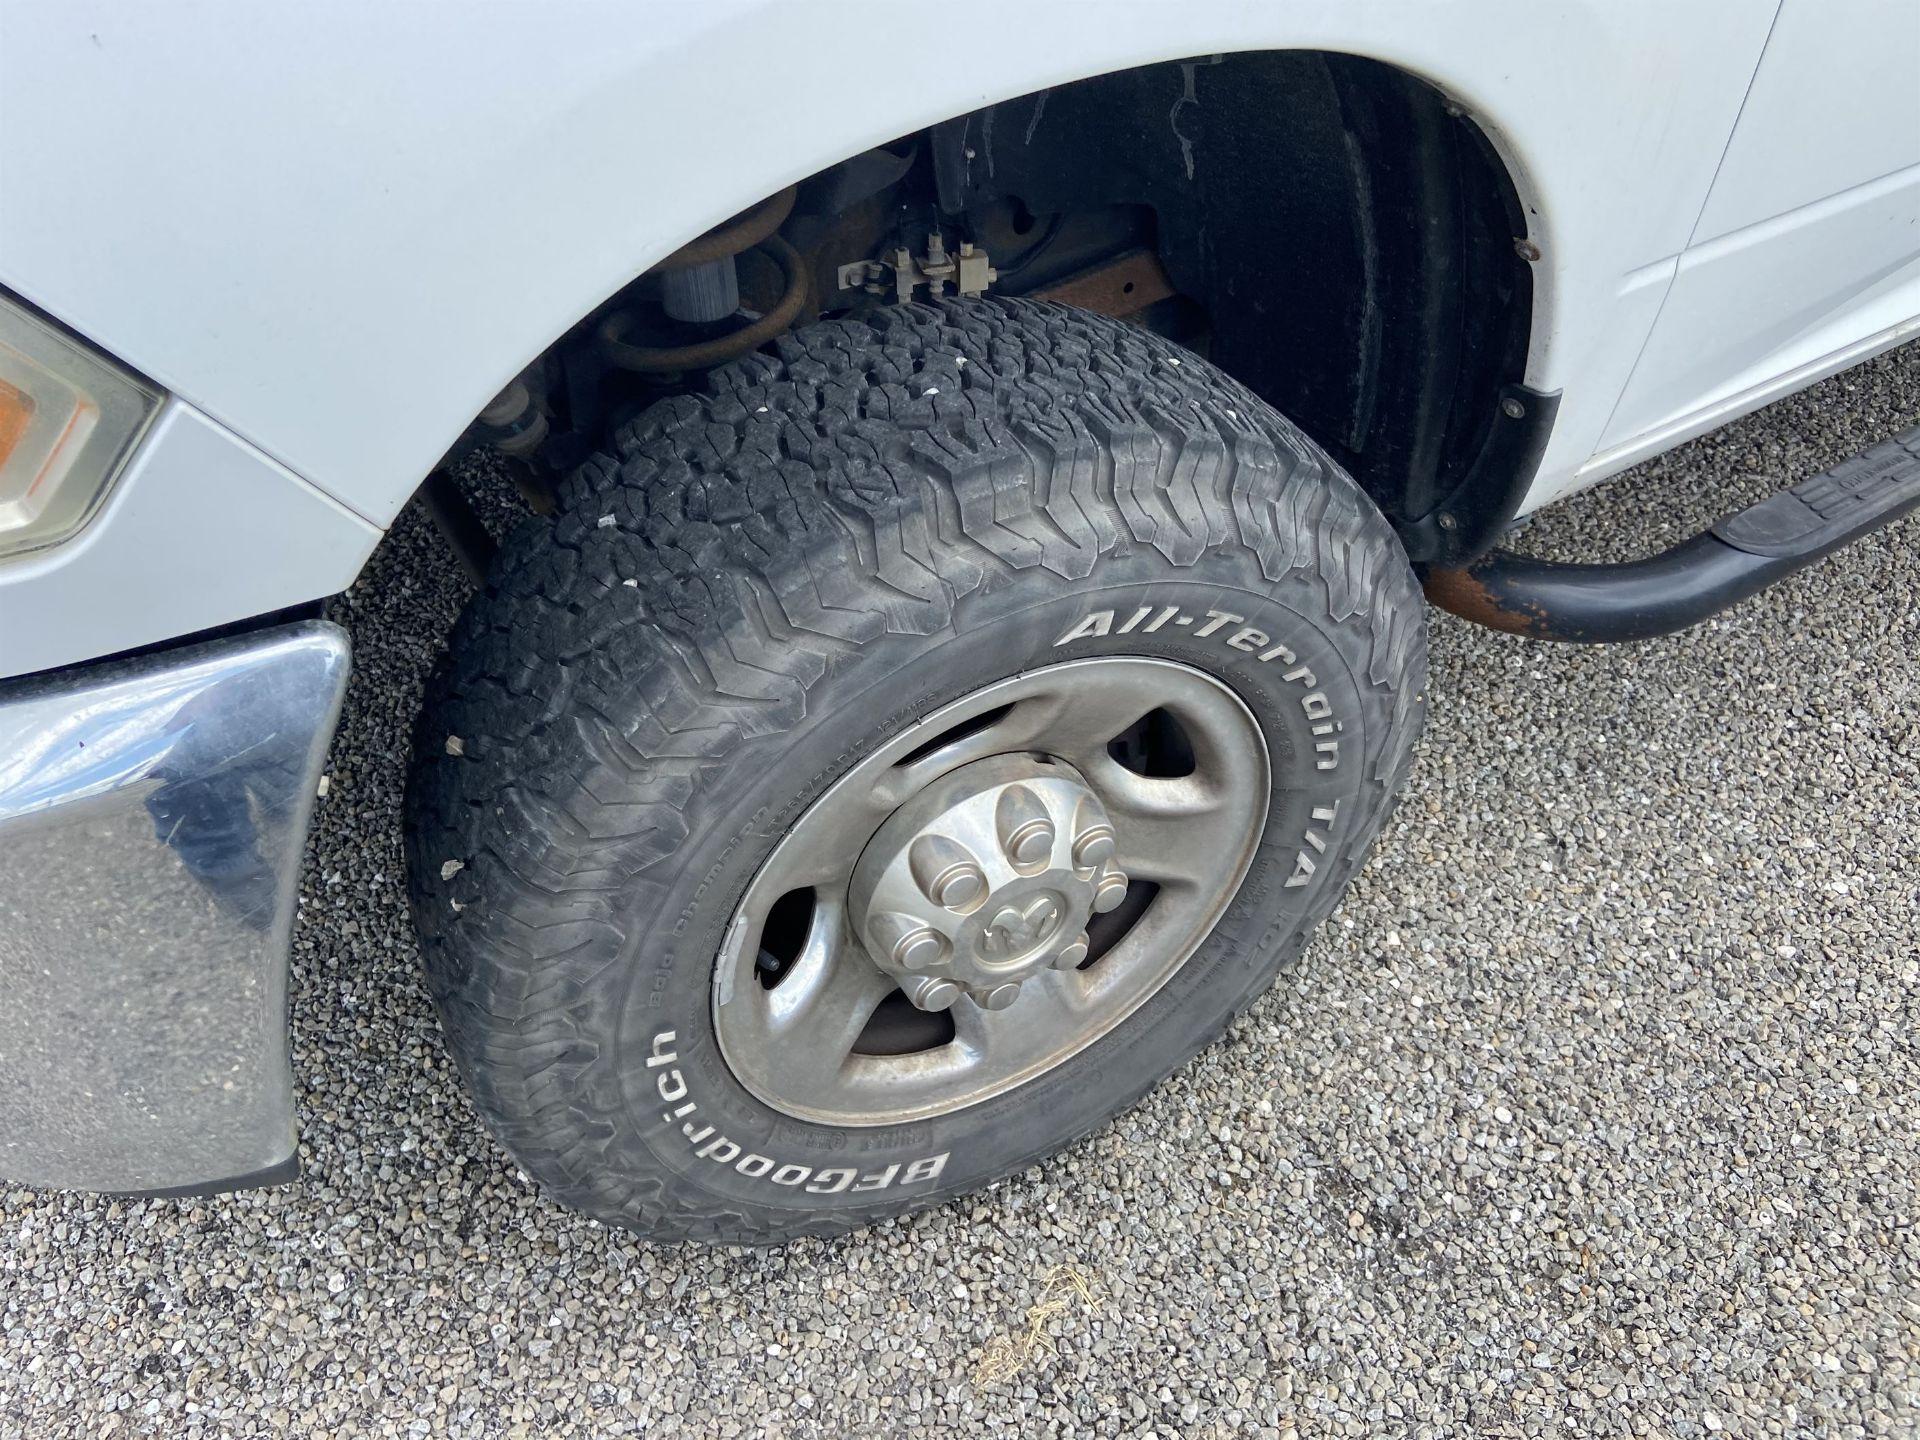 2011 Dodge Ram 2500 HD Crew Cab Long Bed, 212k Miles, Vinyl, 4x4, Gas, VIN # 3D7TT2CT9BG626009 - Image 8 of 16